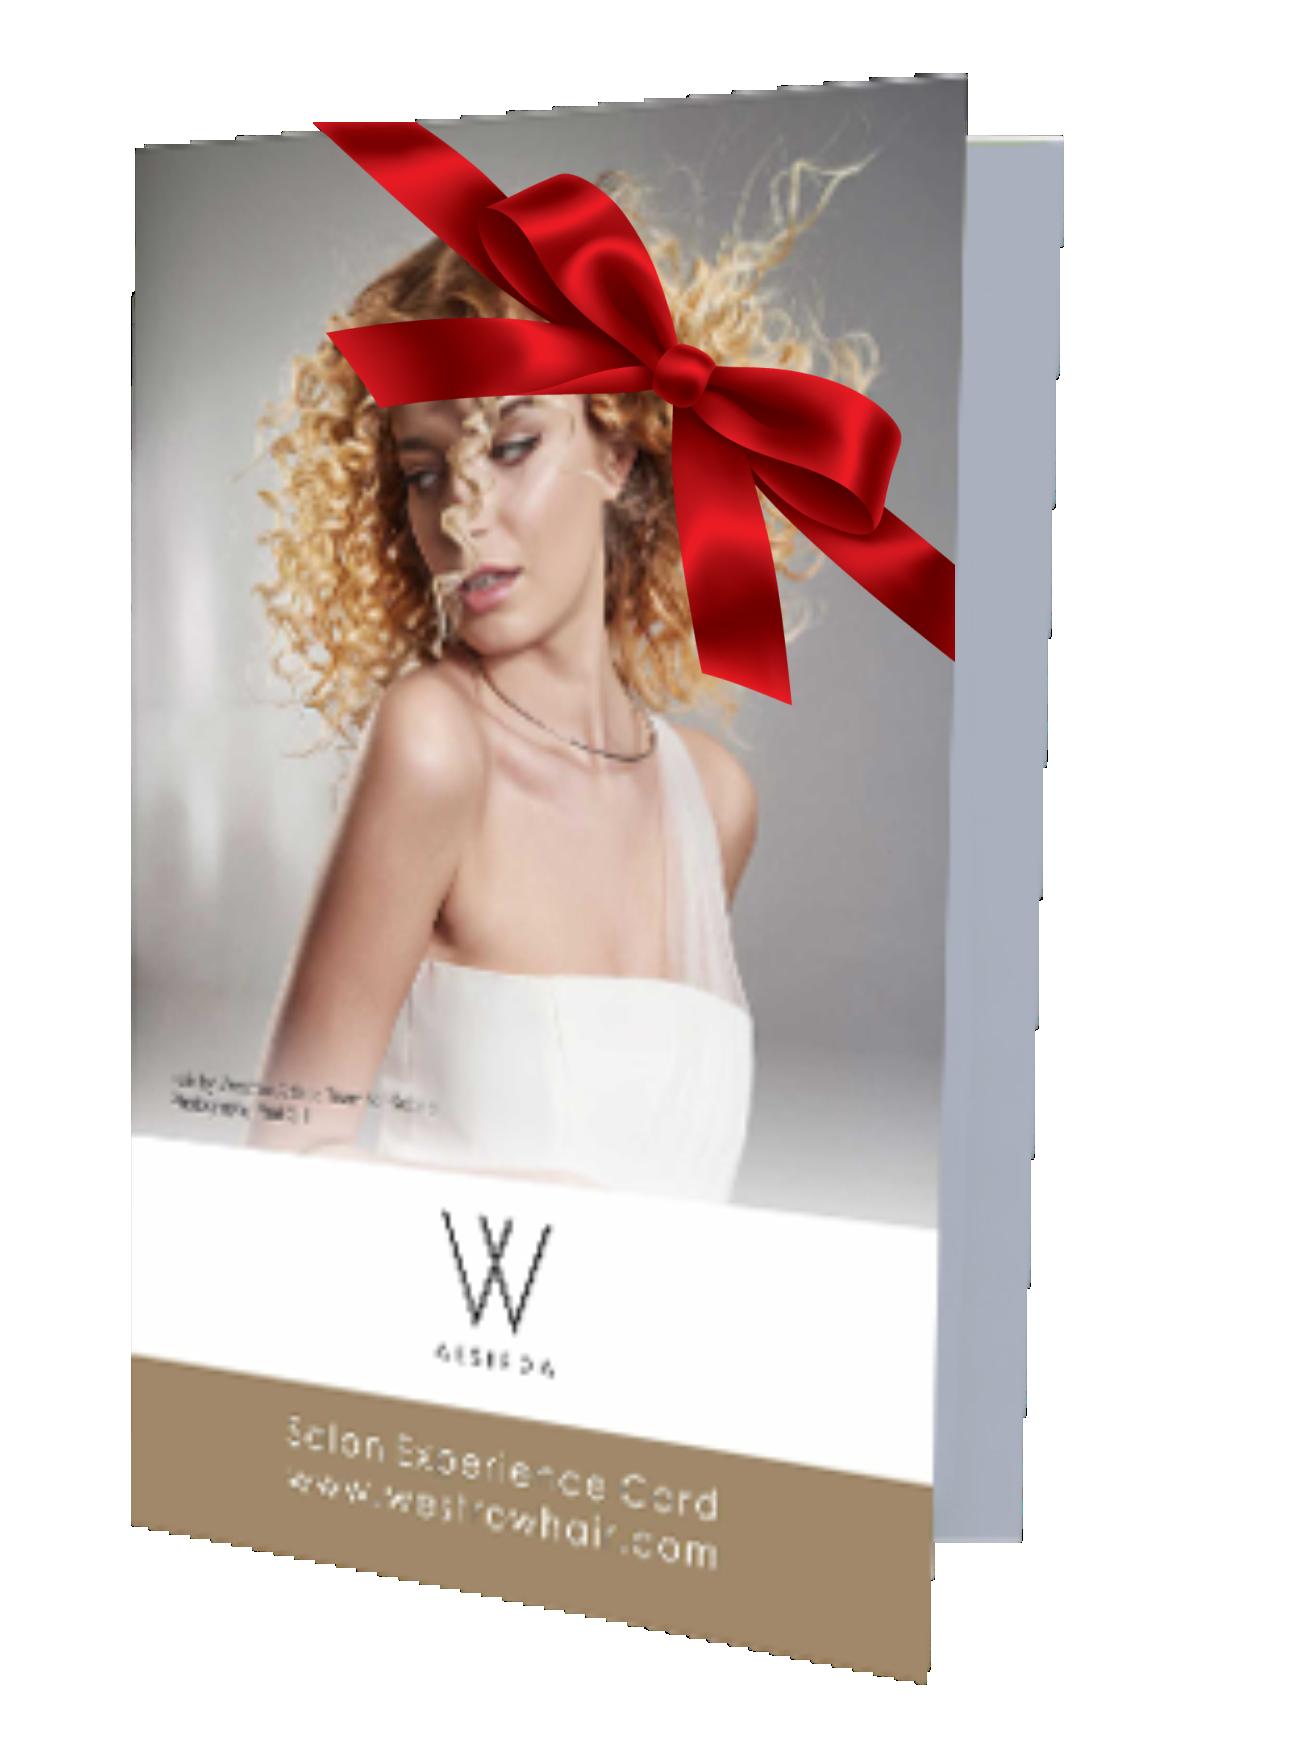 hairdresser offers Westrow